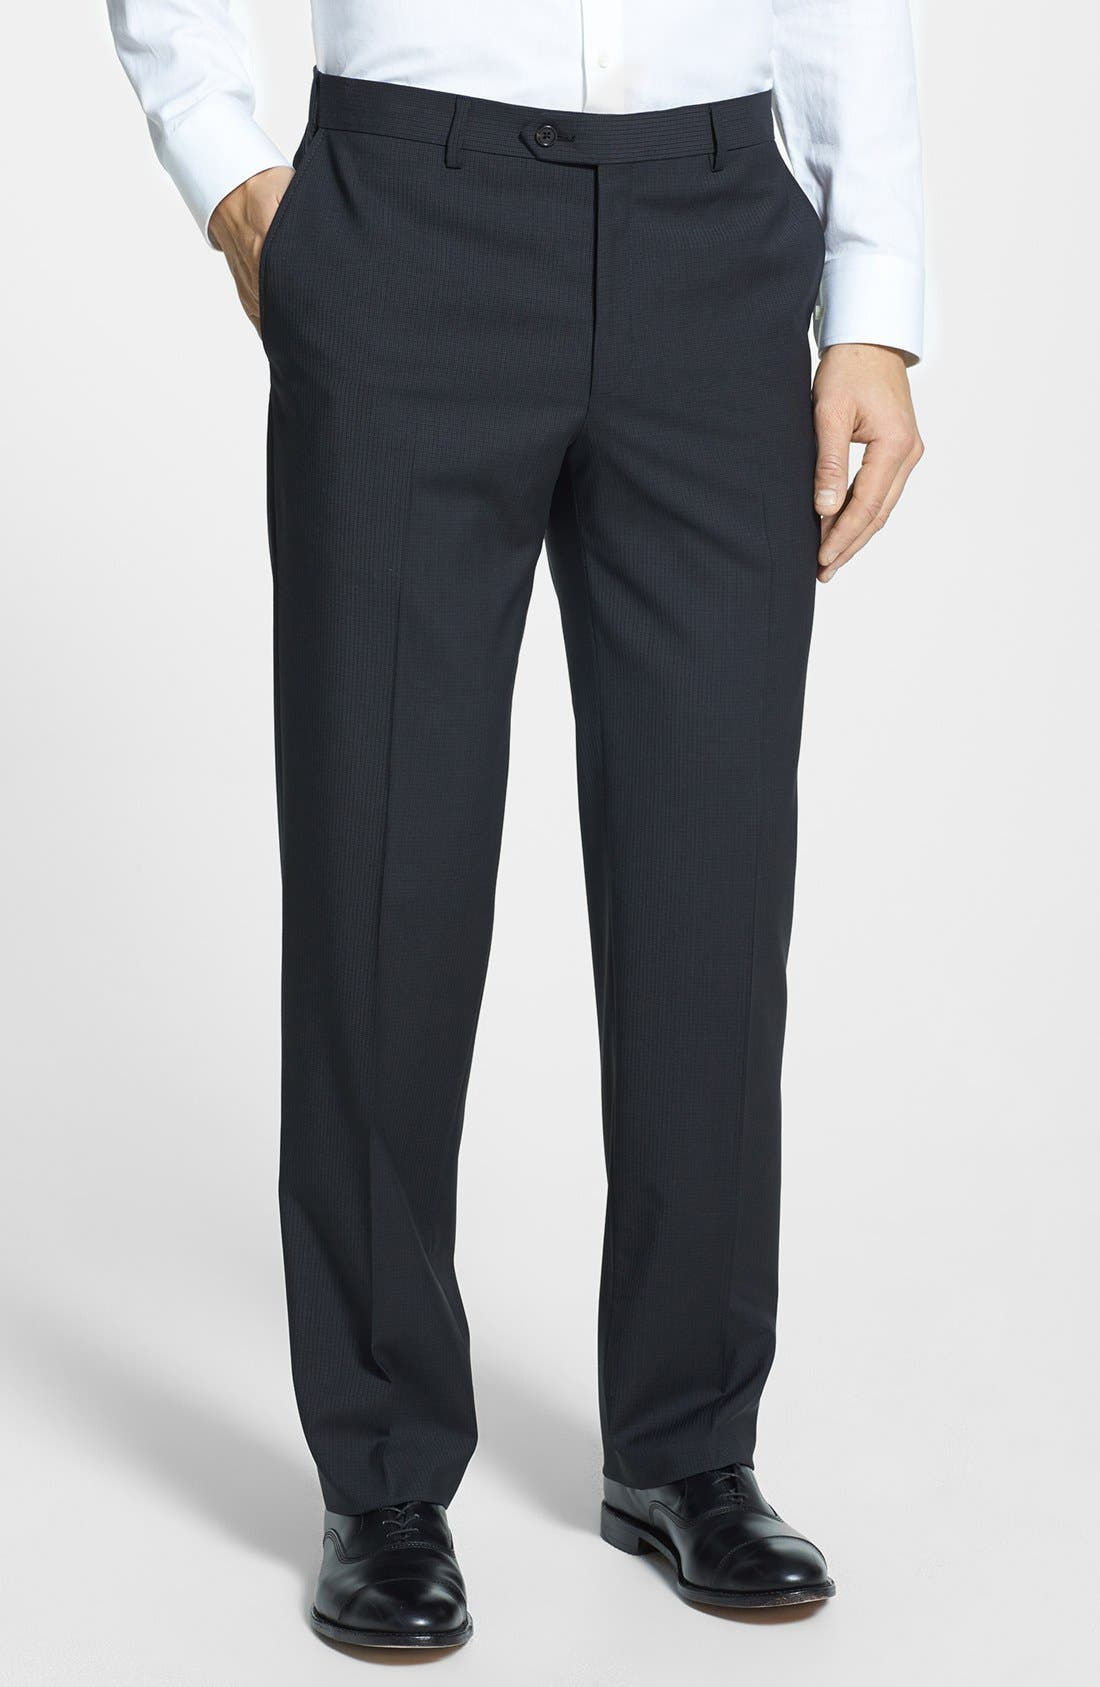 Main Image - Pal Zileri 'Zignone' Flat Front Trousers